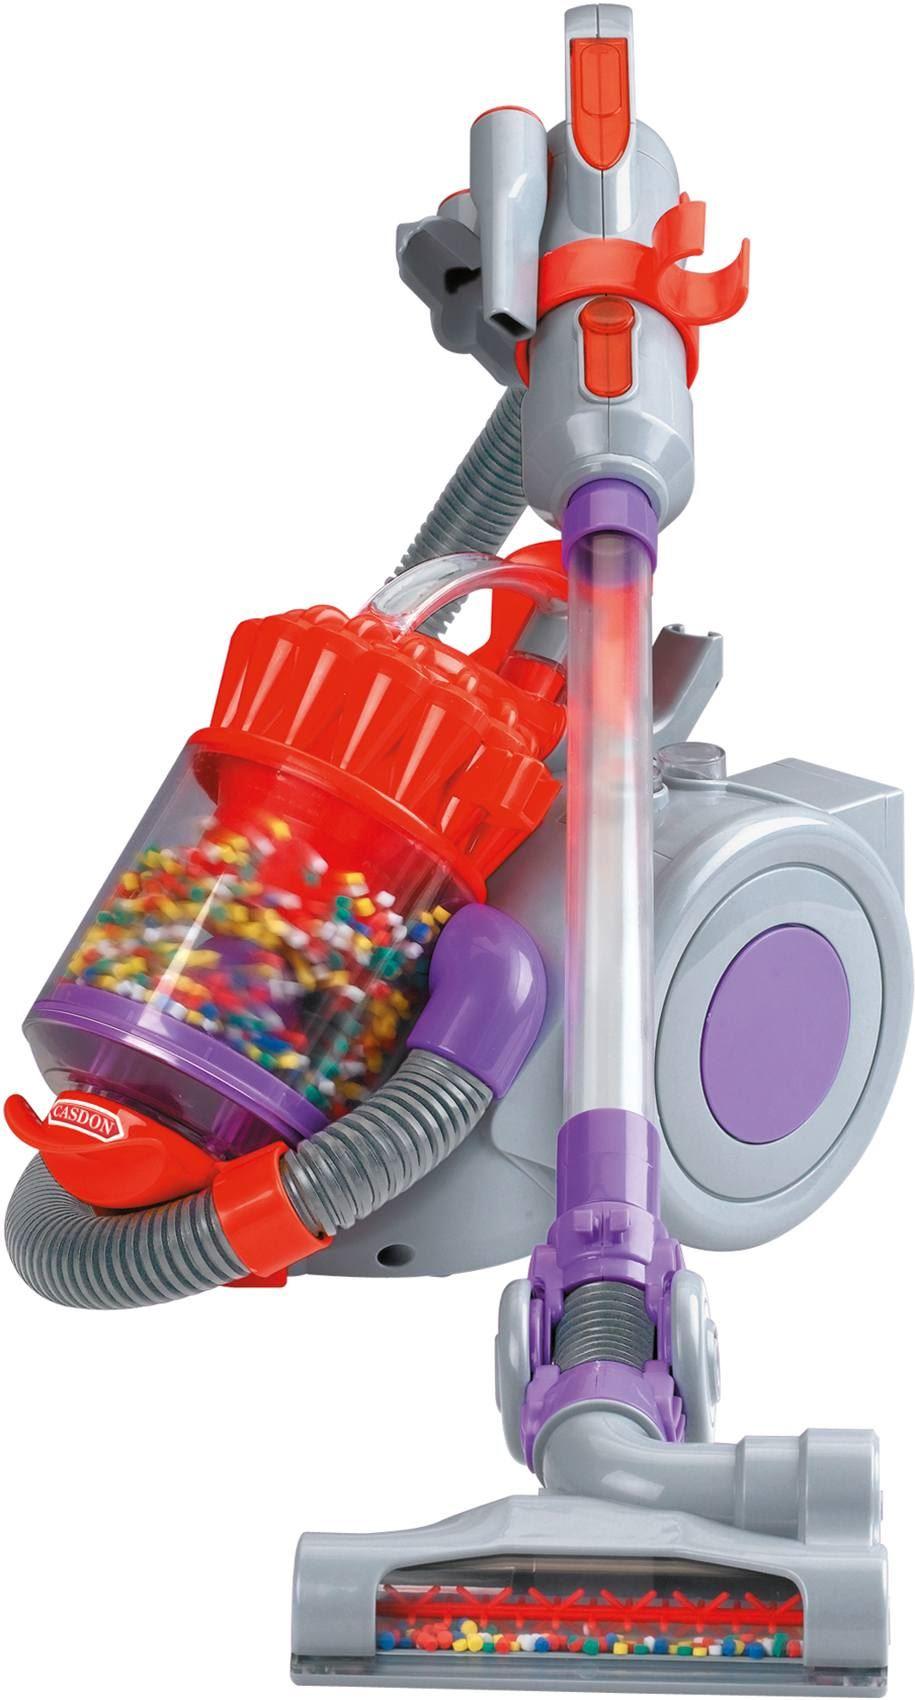 Casdon Dyson Cyclone Action Vacuum Cleaner Little Helper